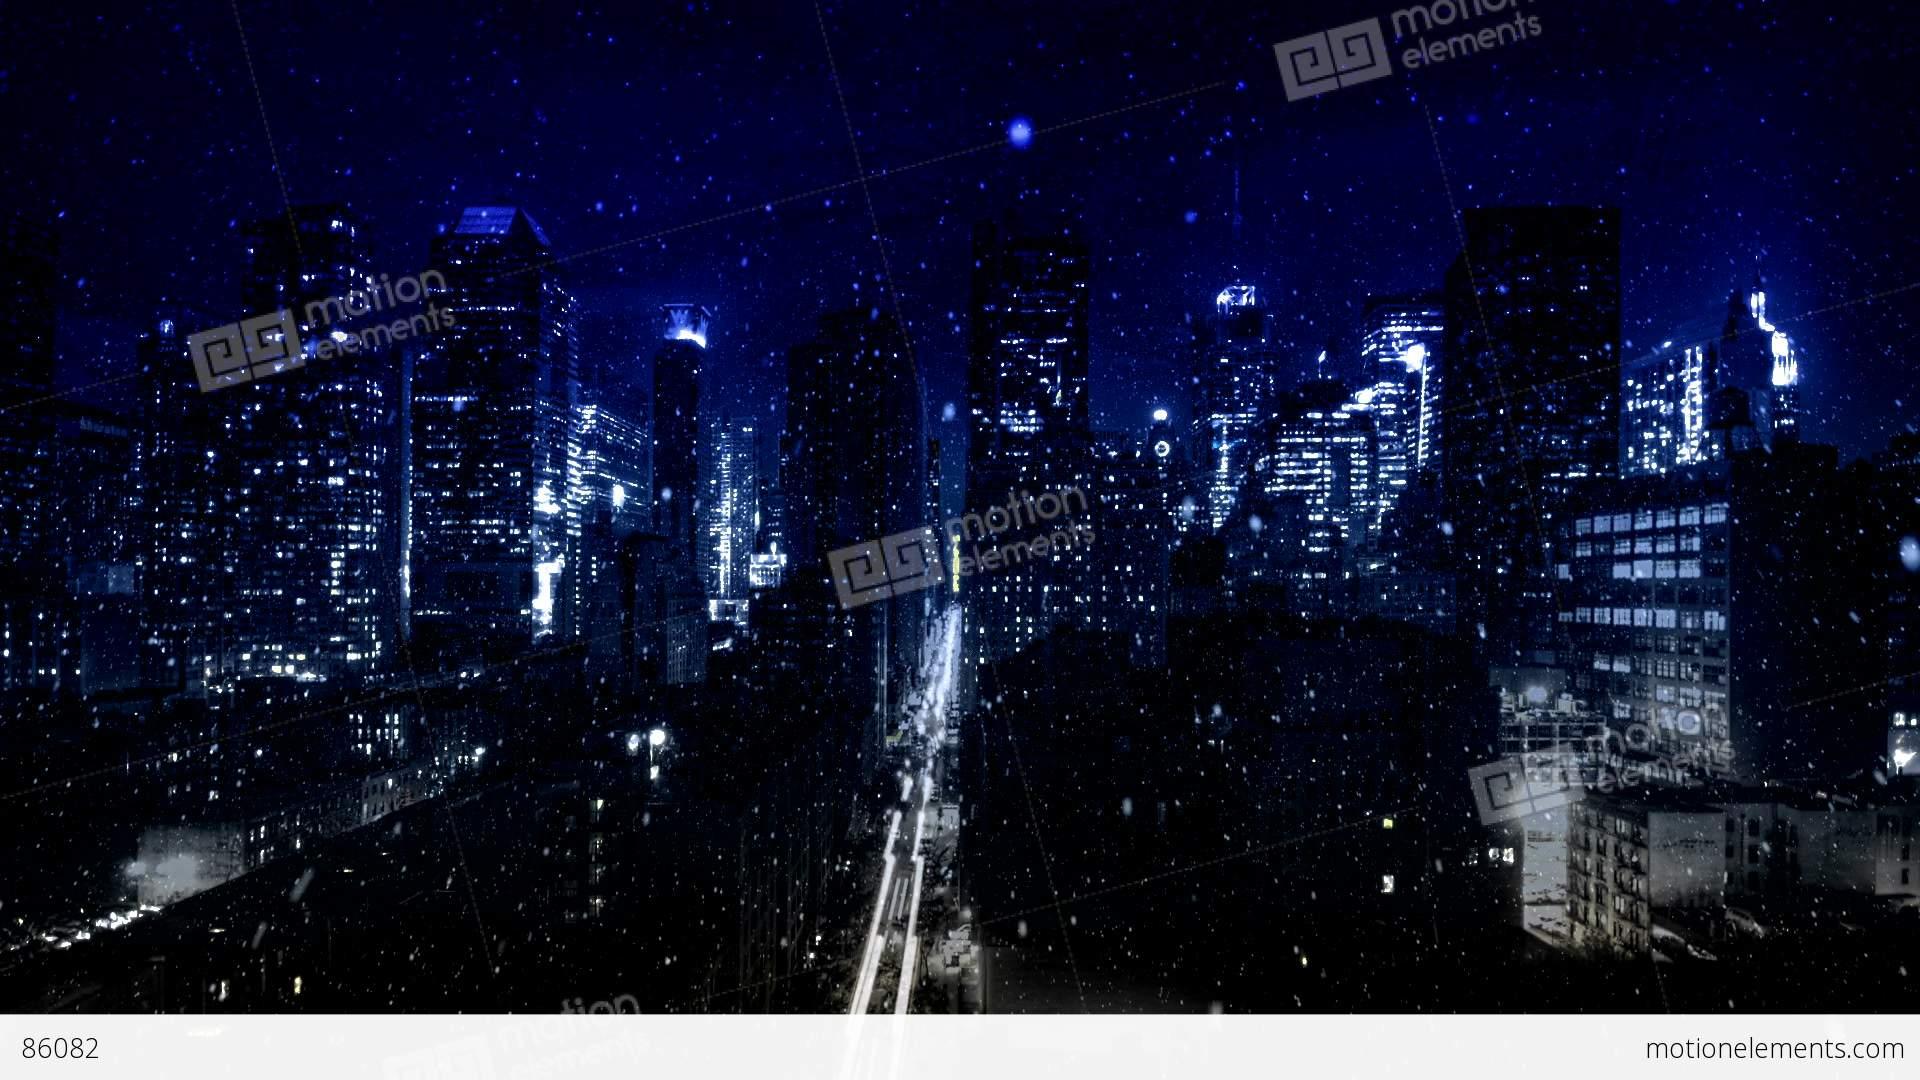 hd snowy city at night pjpeg cg������� 86082